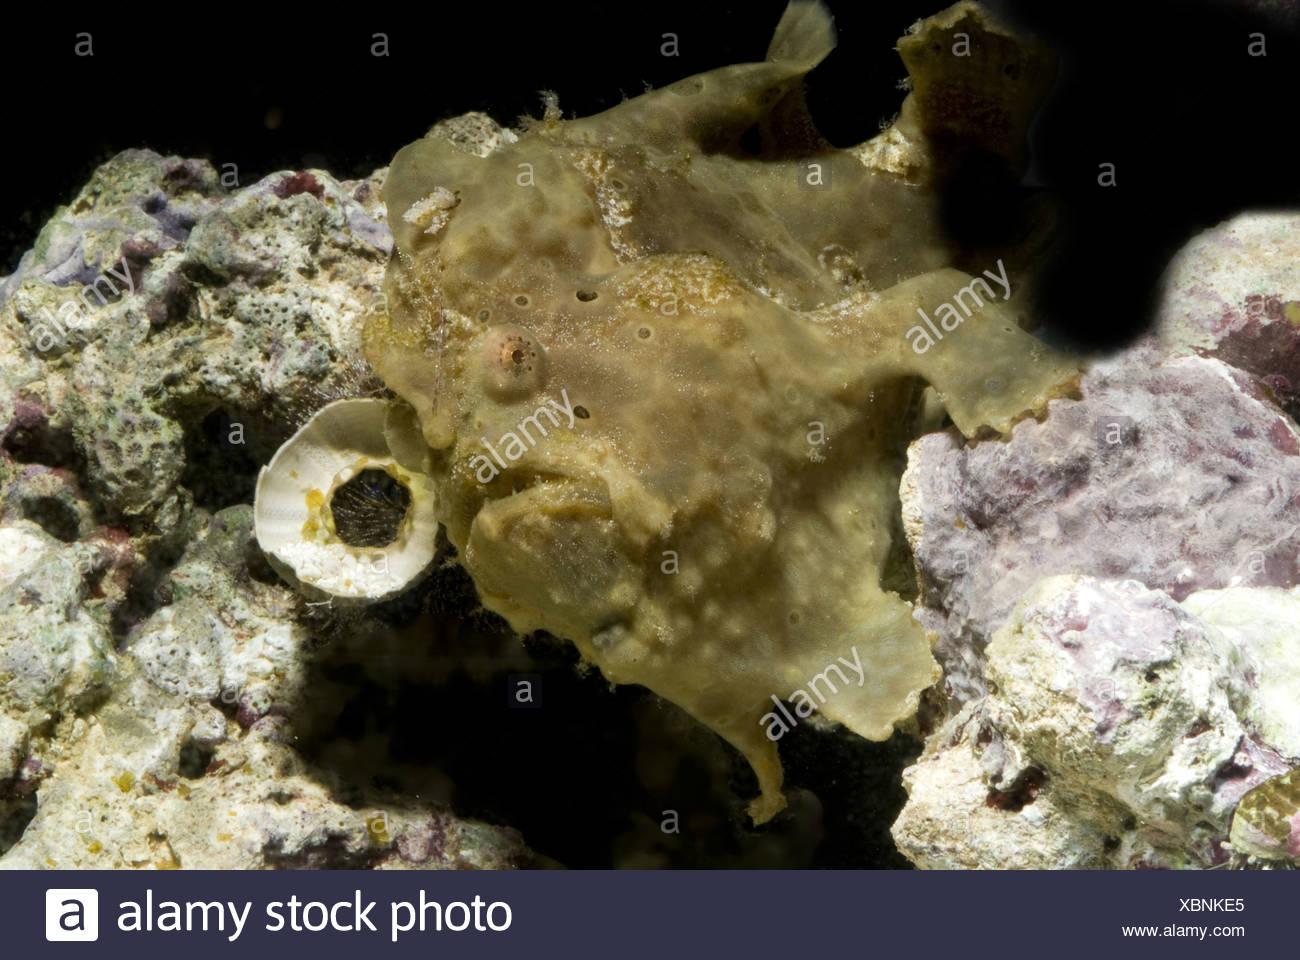 warty frogfish, antennarius maculatus - Stock Image